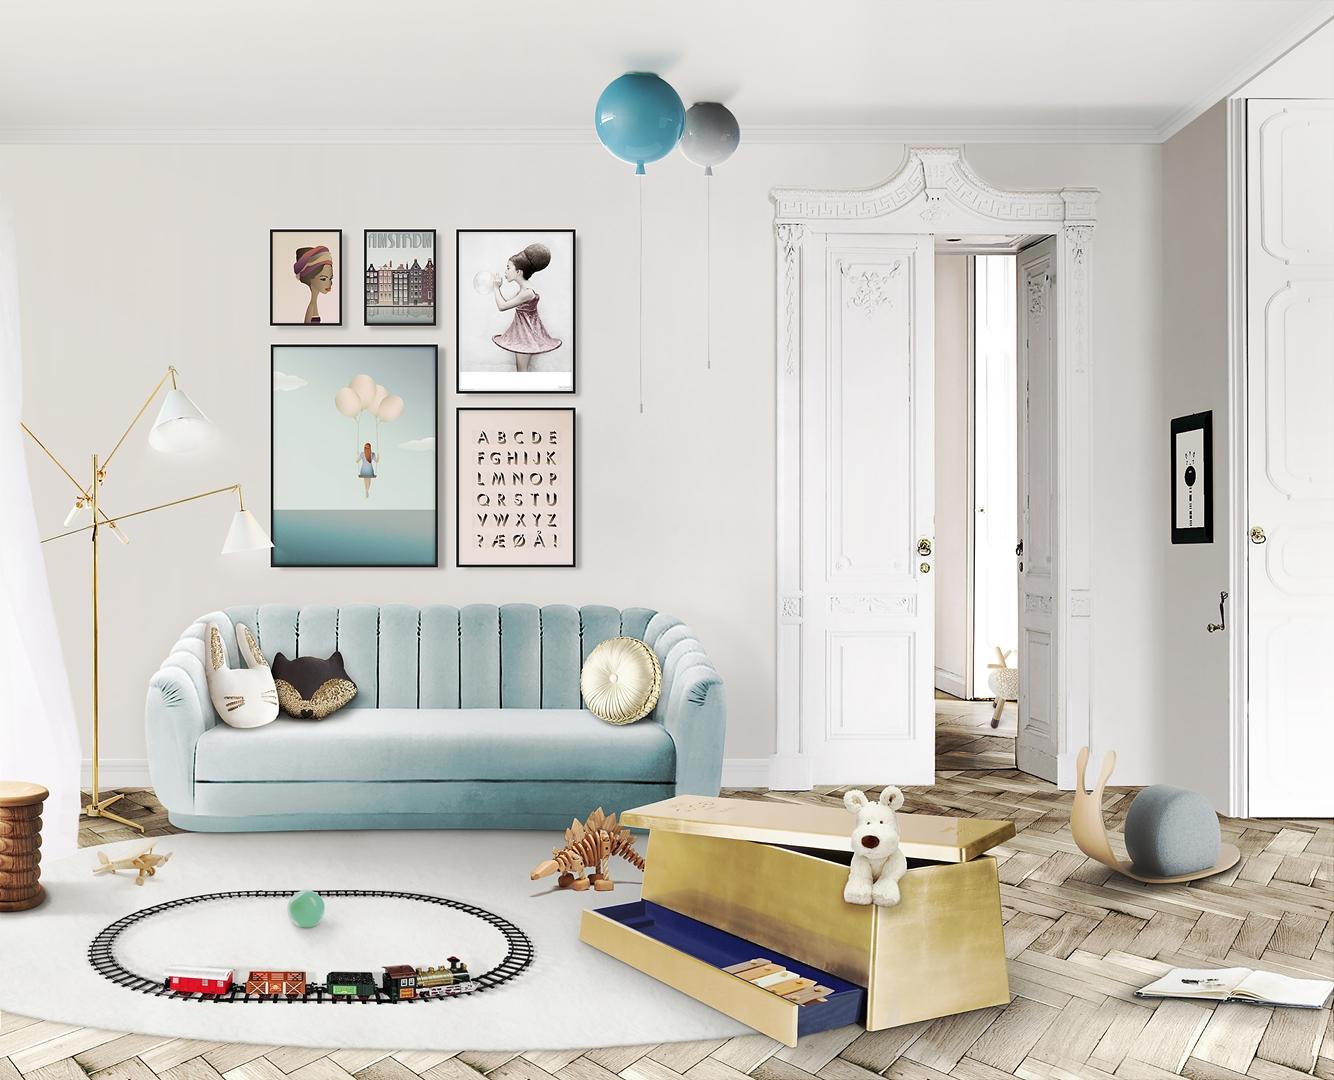 gold-box-ambience-circu-magical-furniture-01 (Copy)